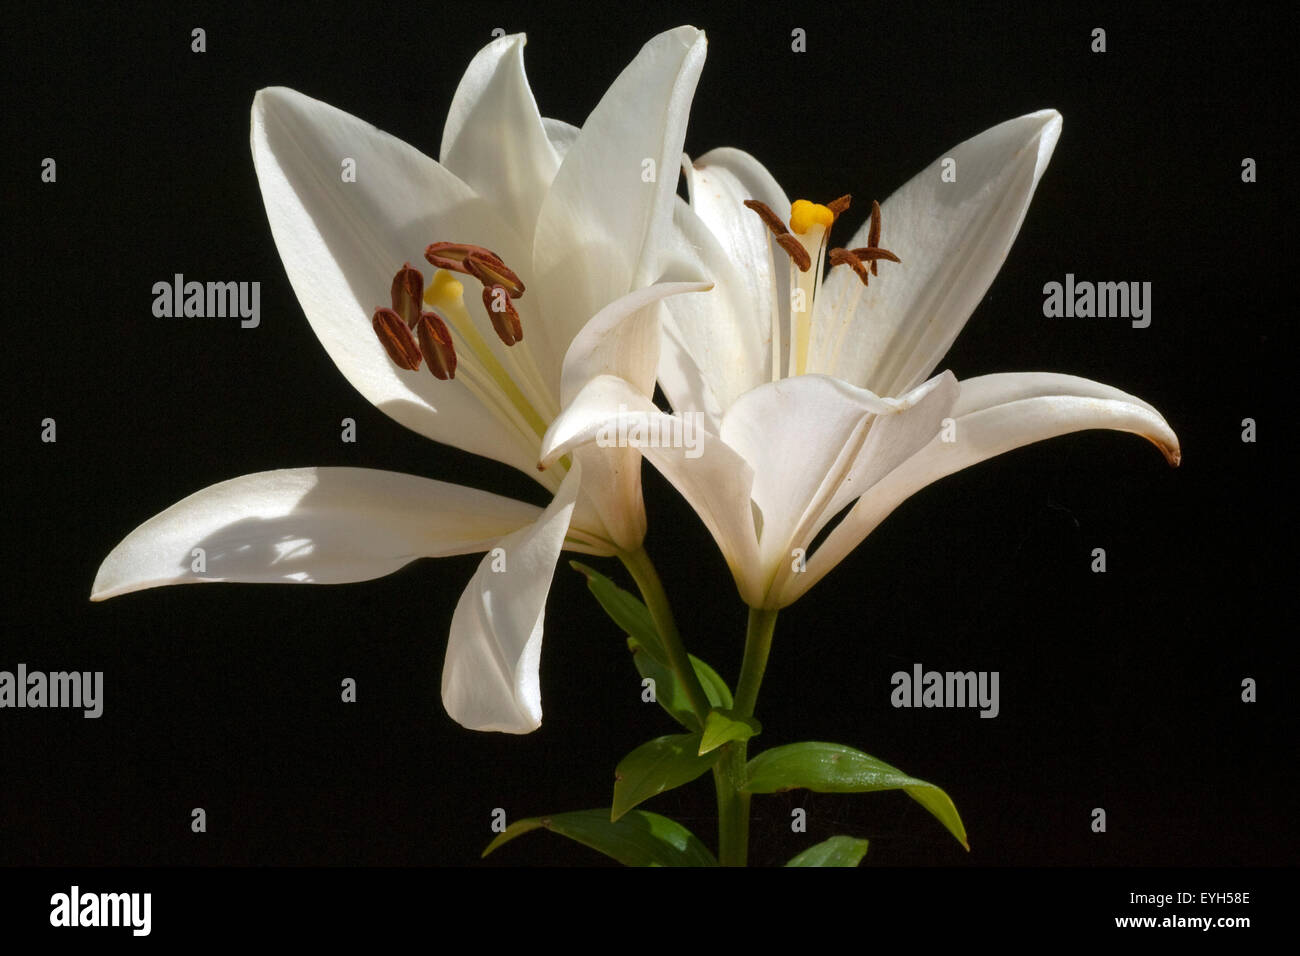 Weisse, lilie; hybride; lilien; hybriden; - Stock Image